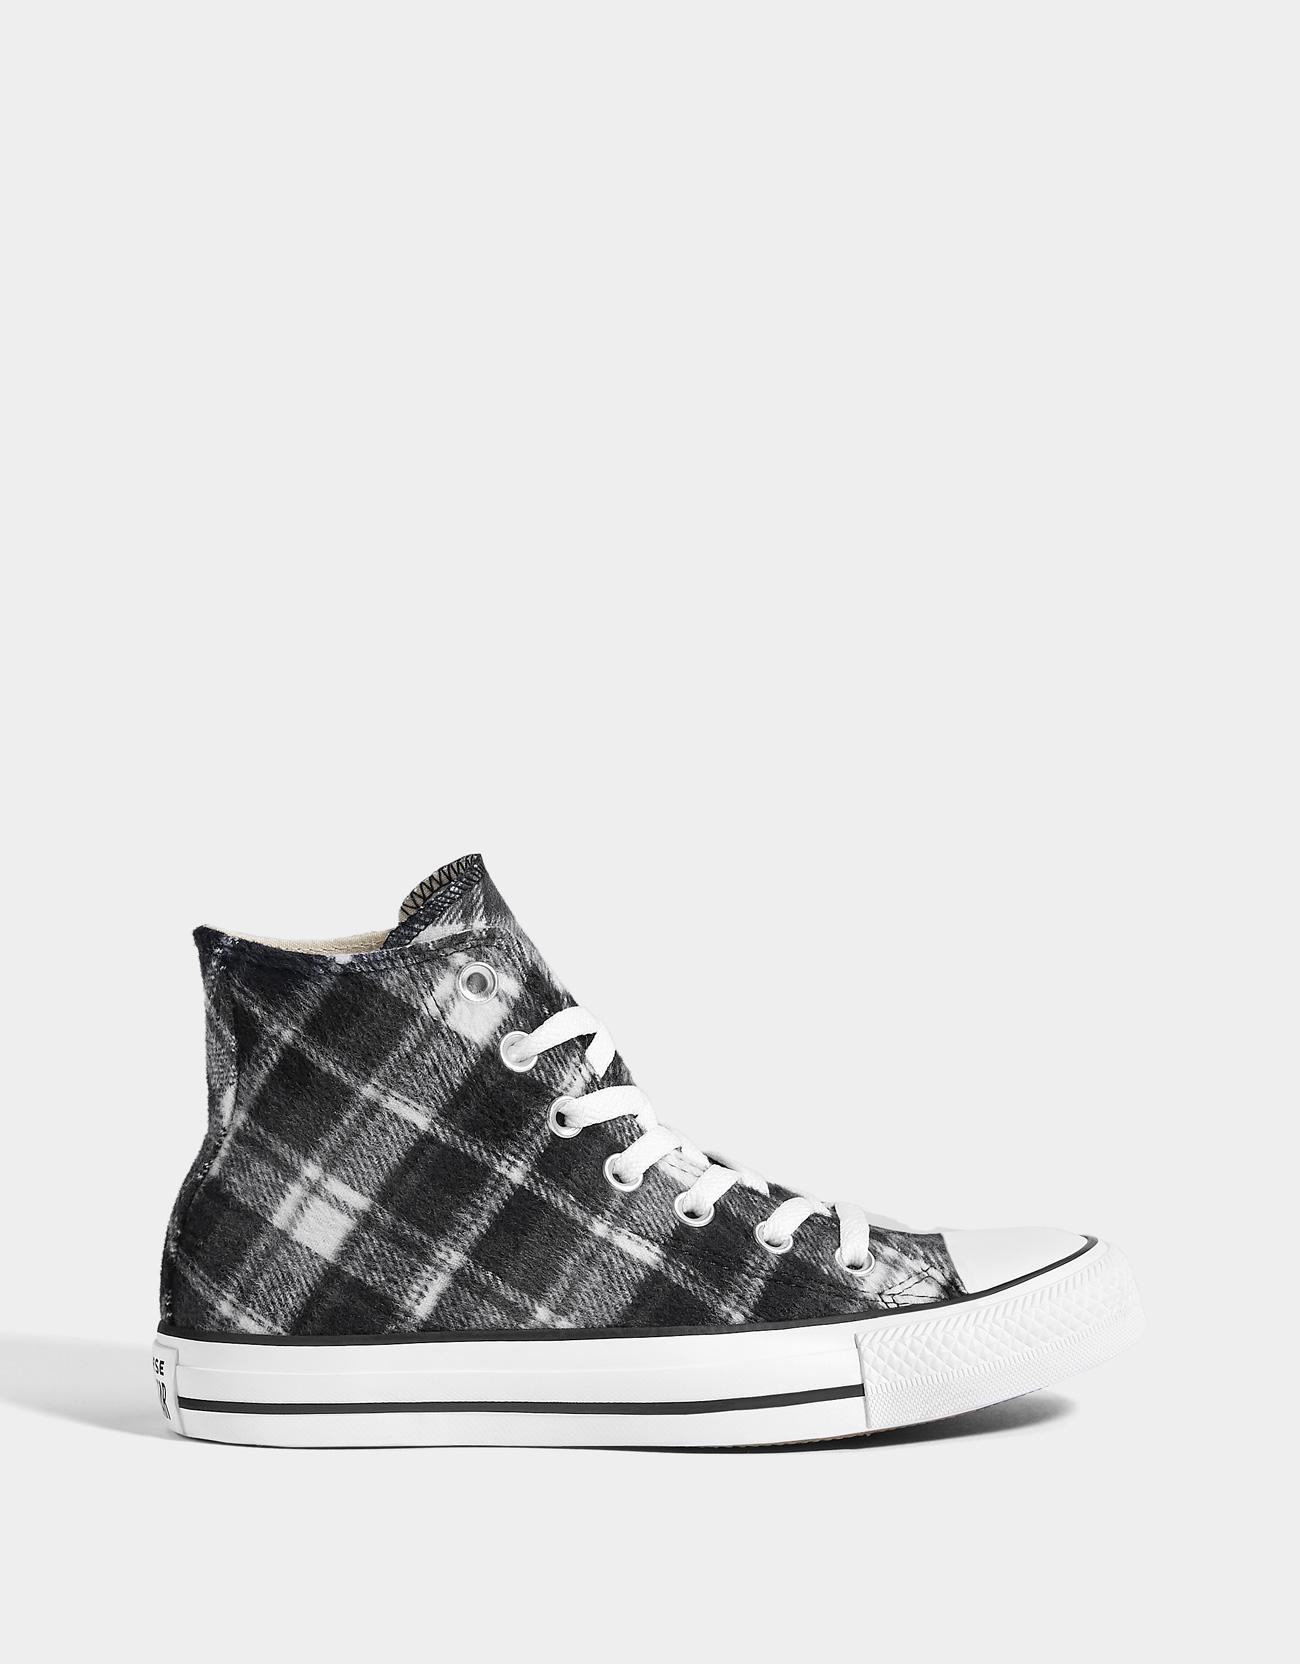 ab1a704e8f7 CONVERSE CHUCK TAYLOR ALL STAR High-top trainers - Shoes - Bershka Spain